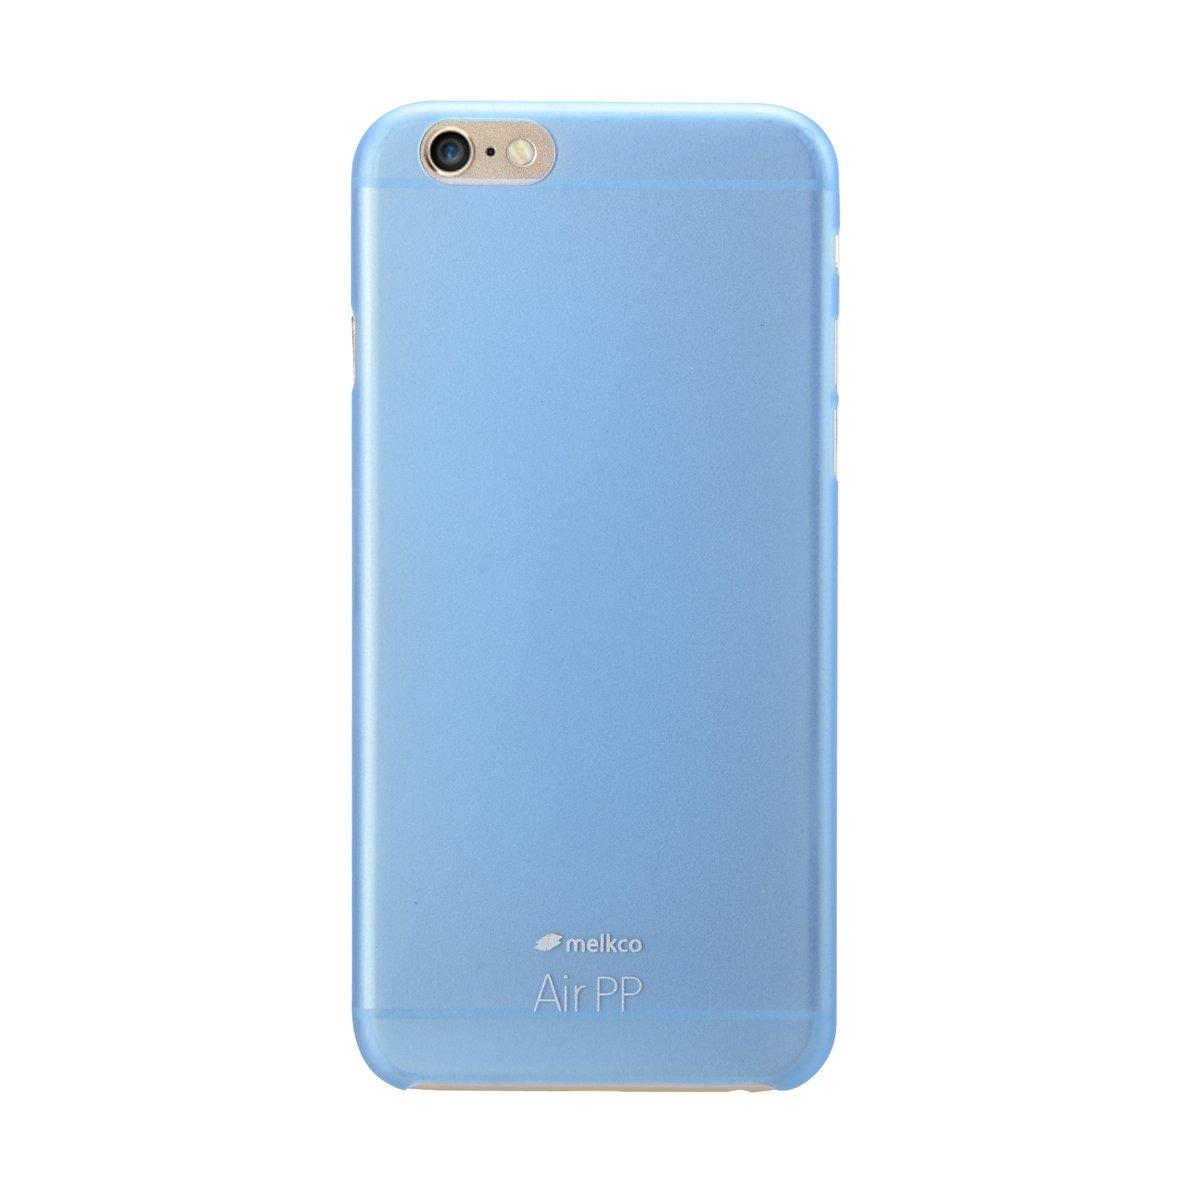 "iPhone 6 Plus/6S Plus (5.5"") Air PP 超薄防刮殼 - 藍色(附送屏幕保護貼)"